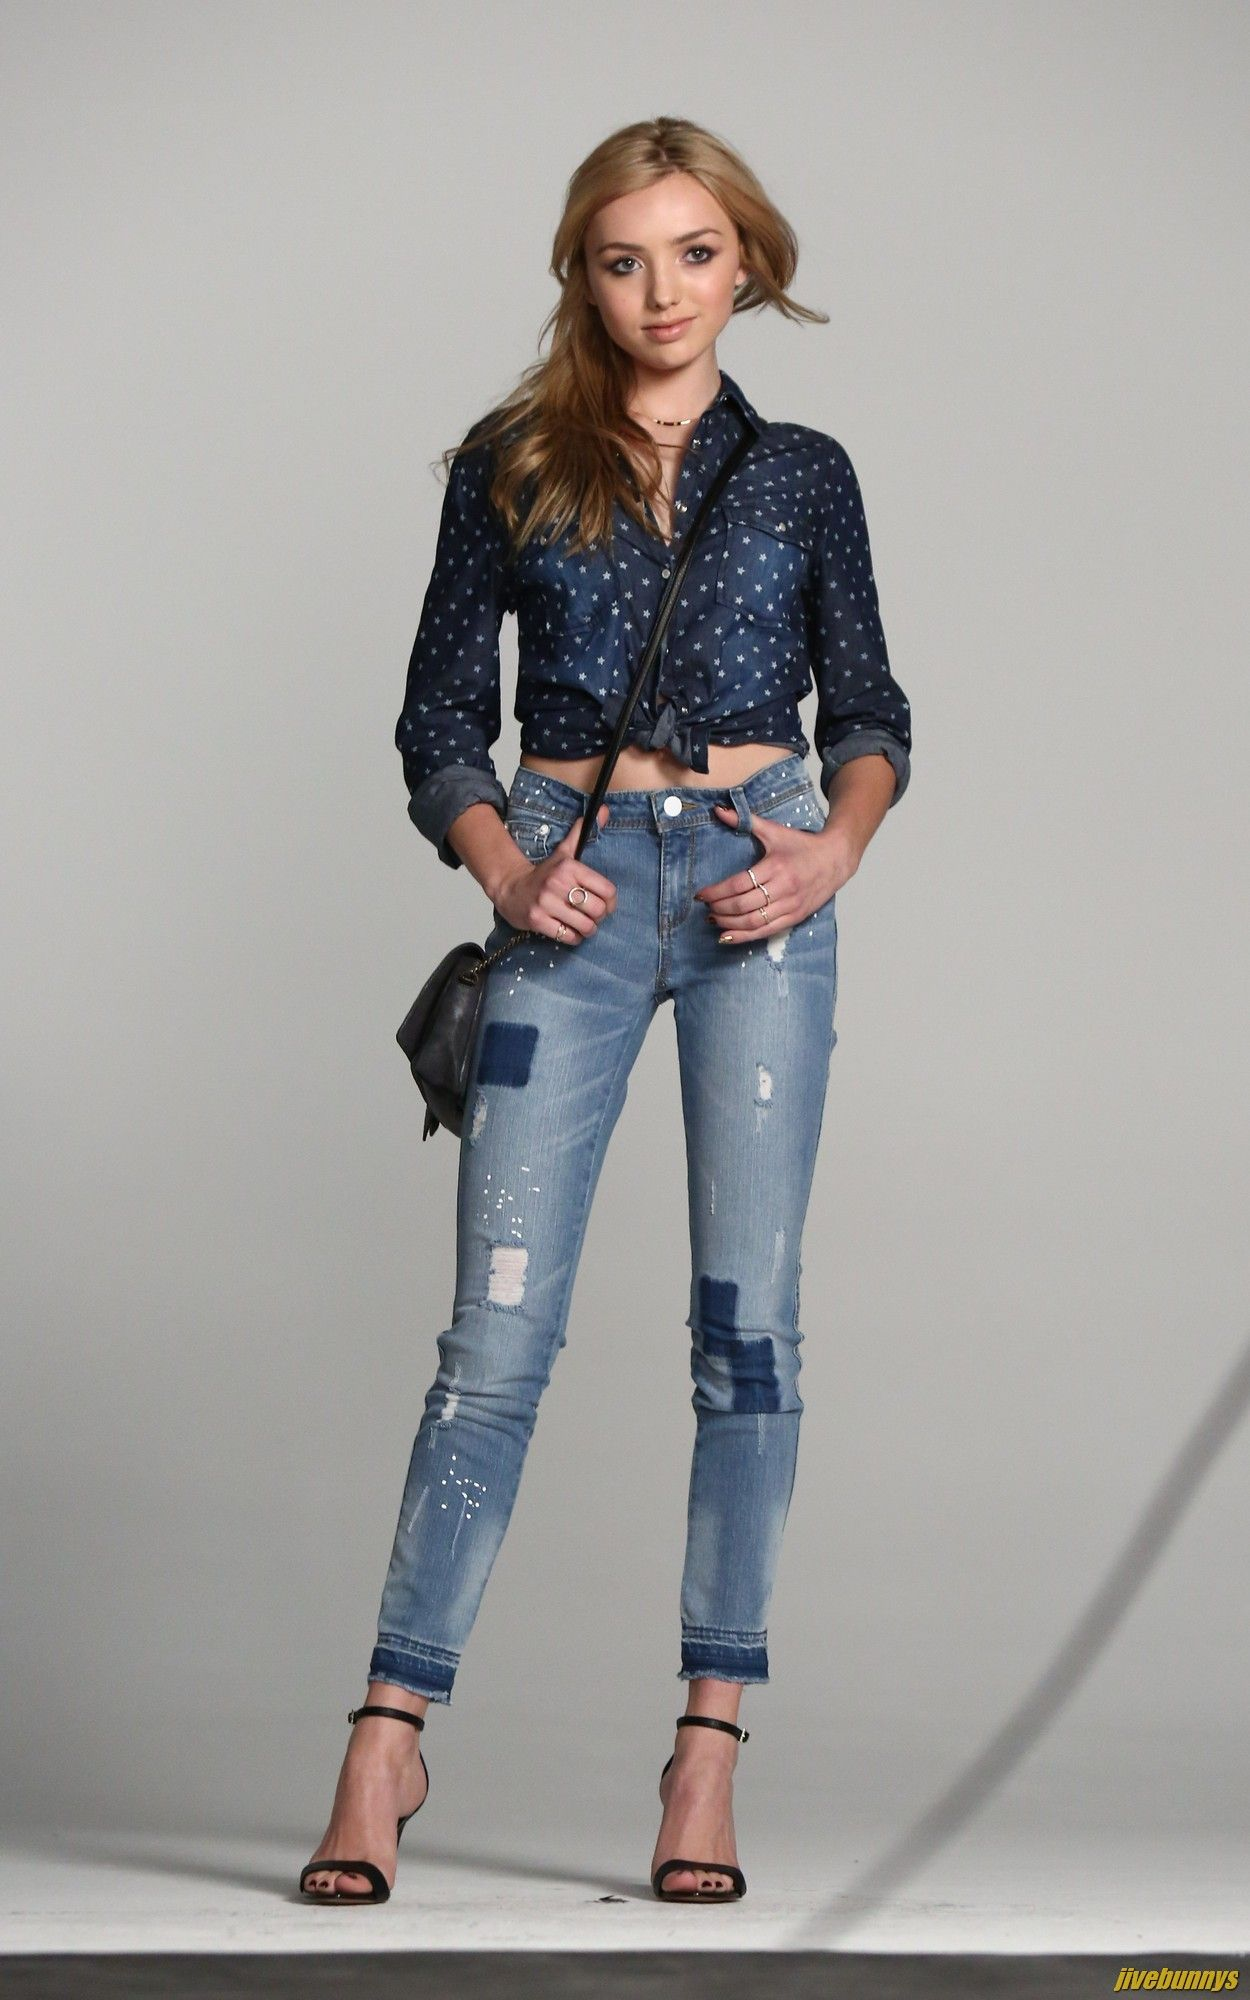 Alyssa Milano Hot see thru dressed | Hot Female Celebrity